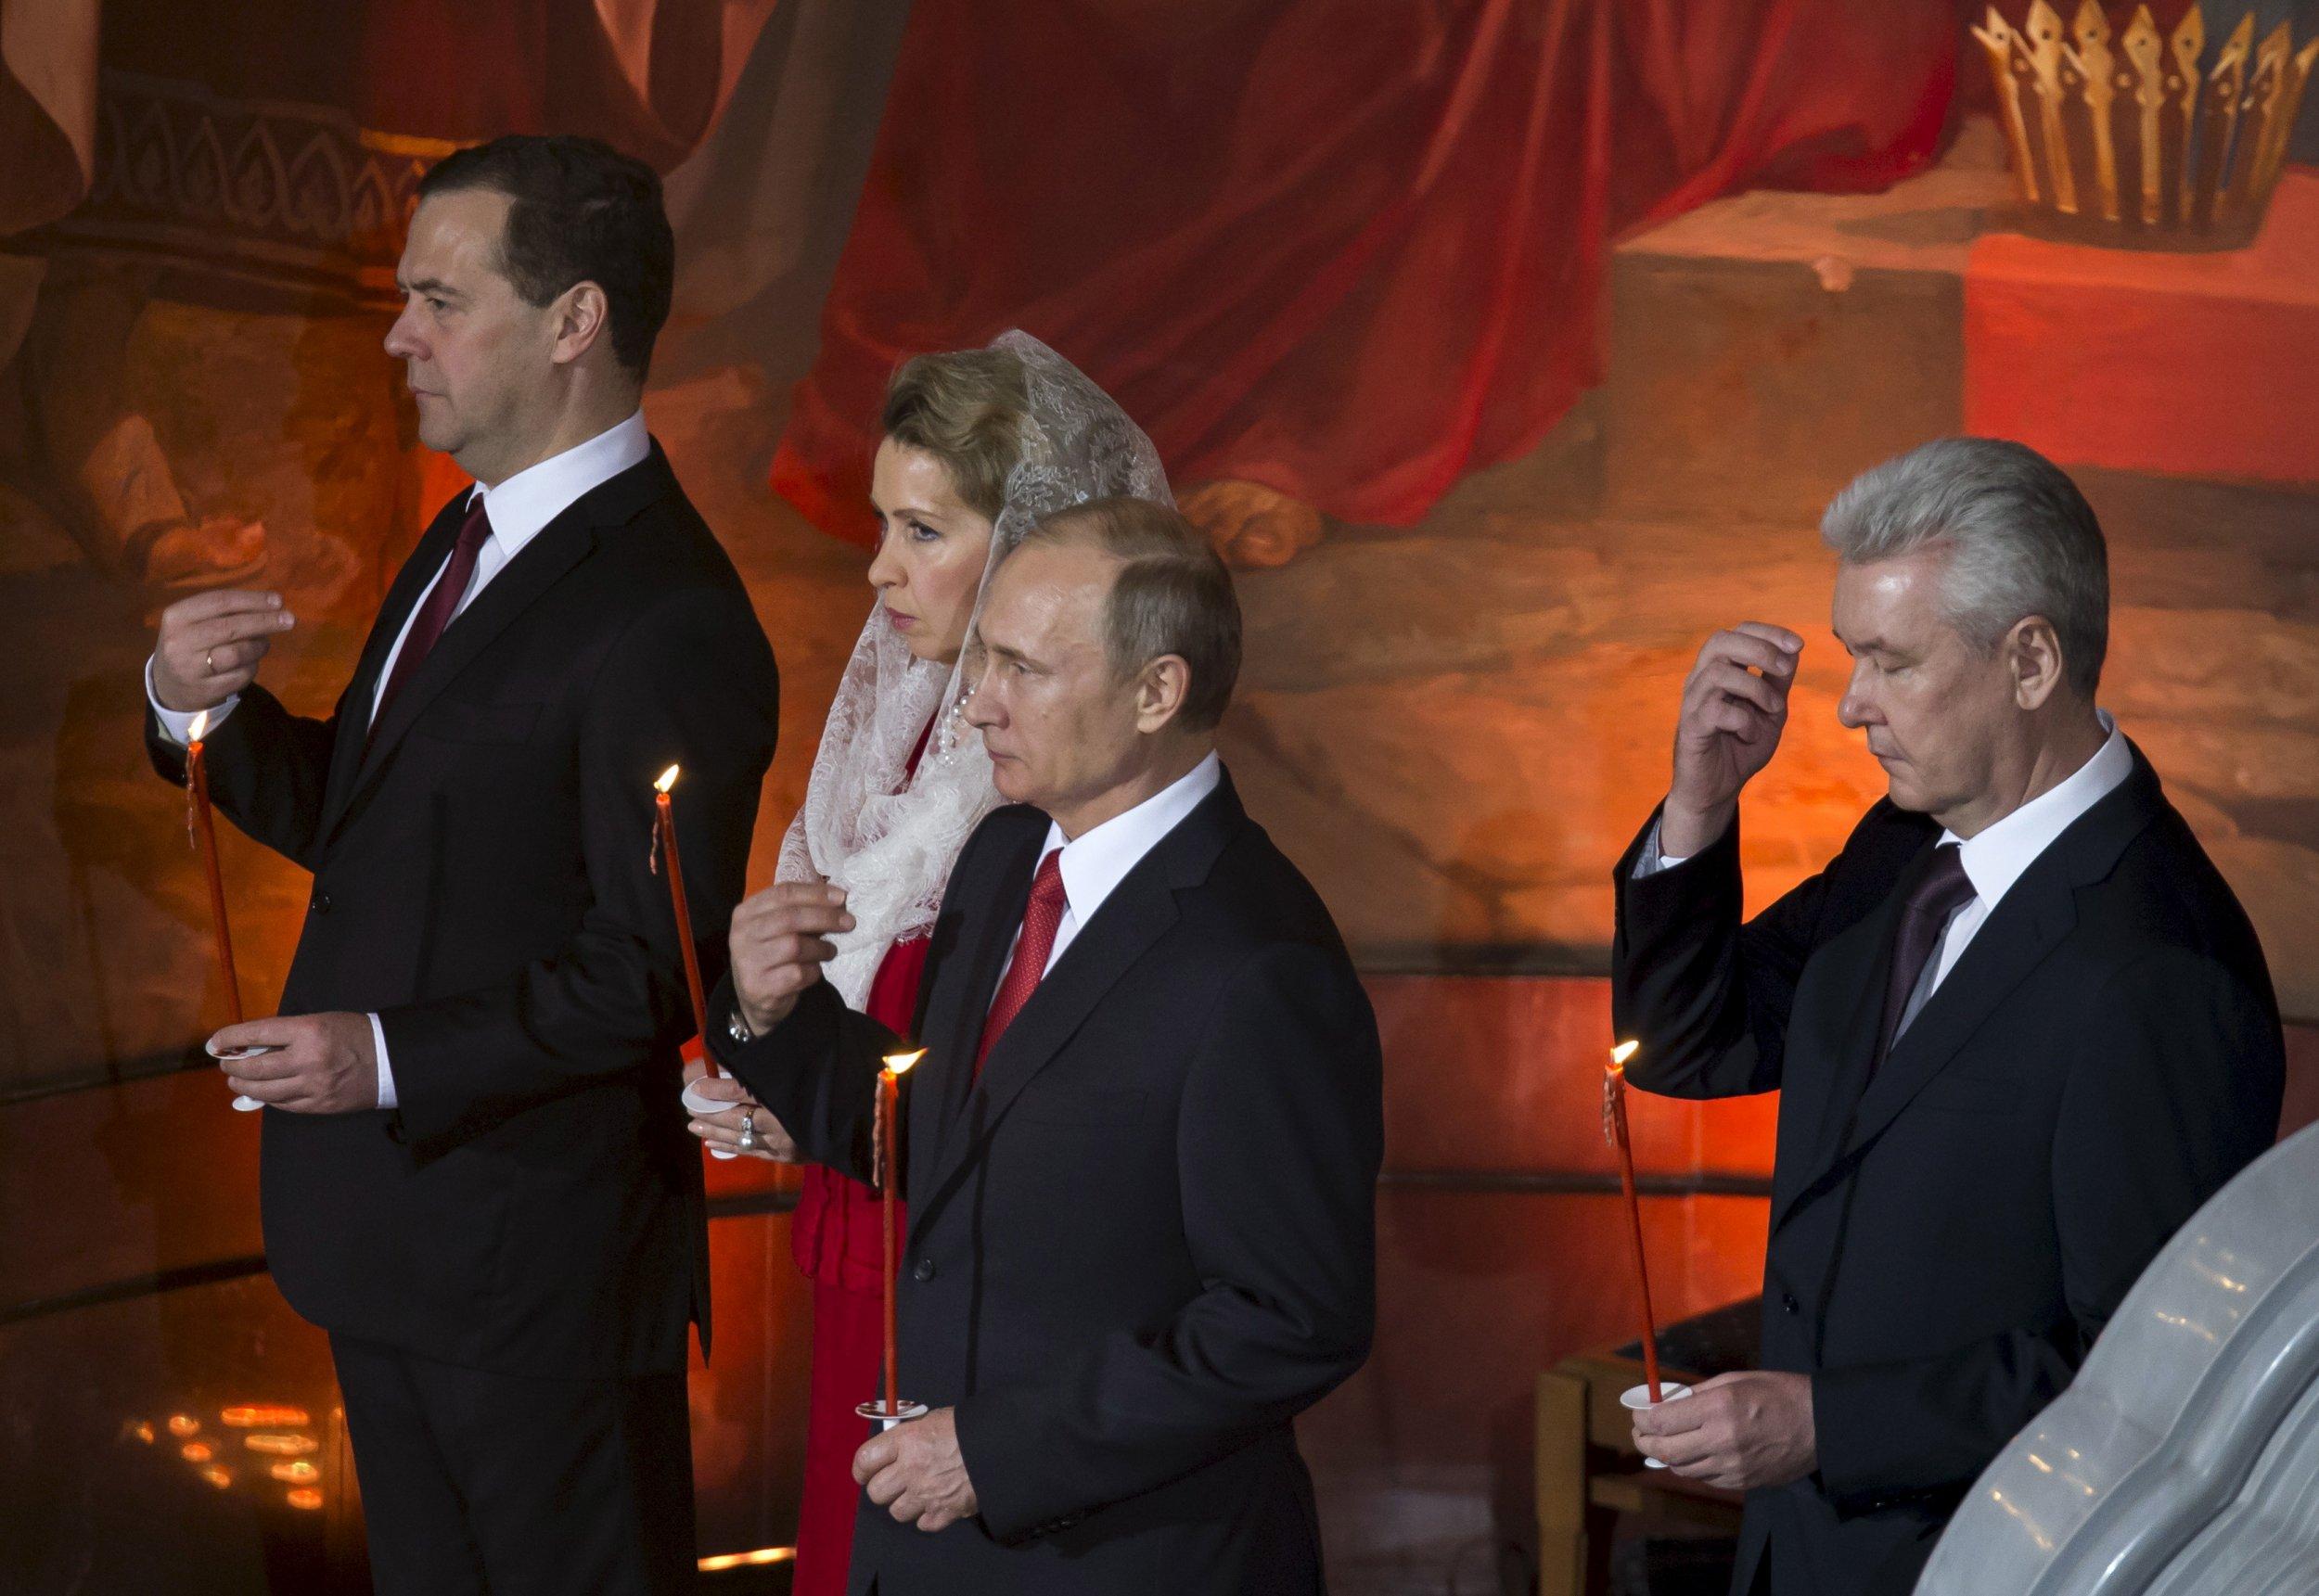 Putin, Sobyanin and the Medvedev family